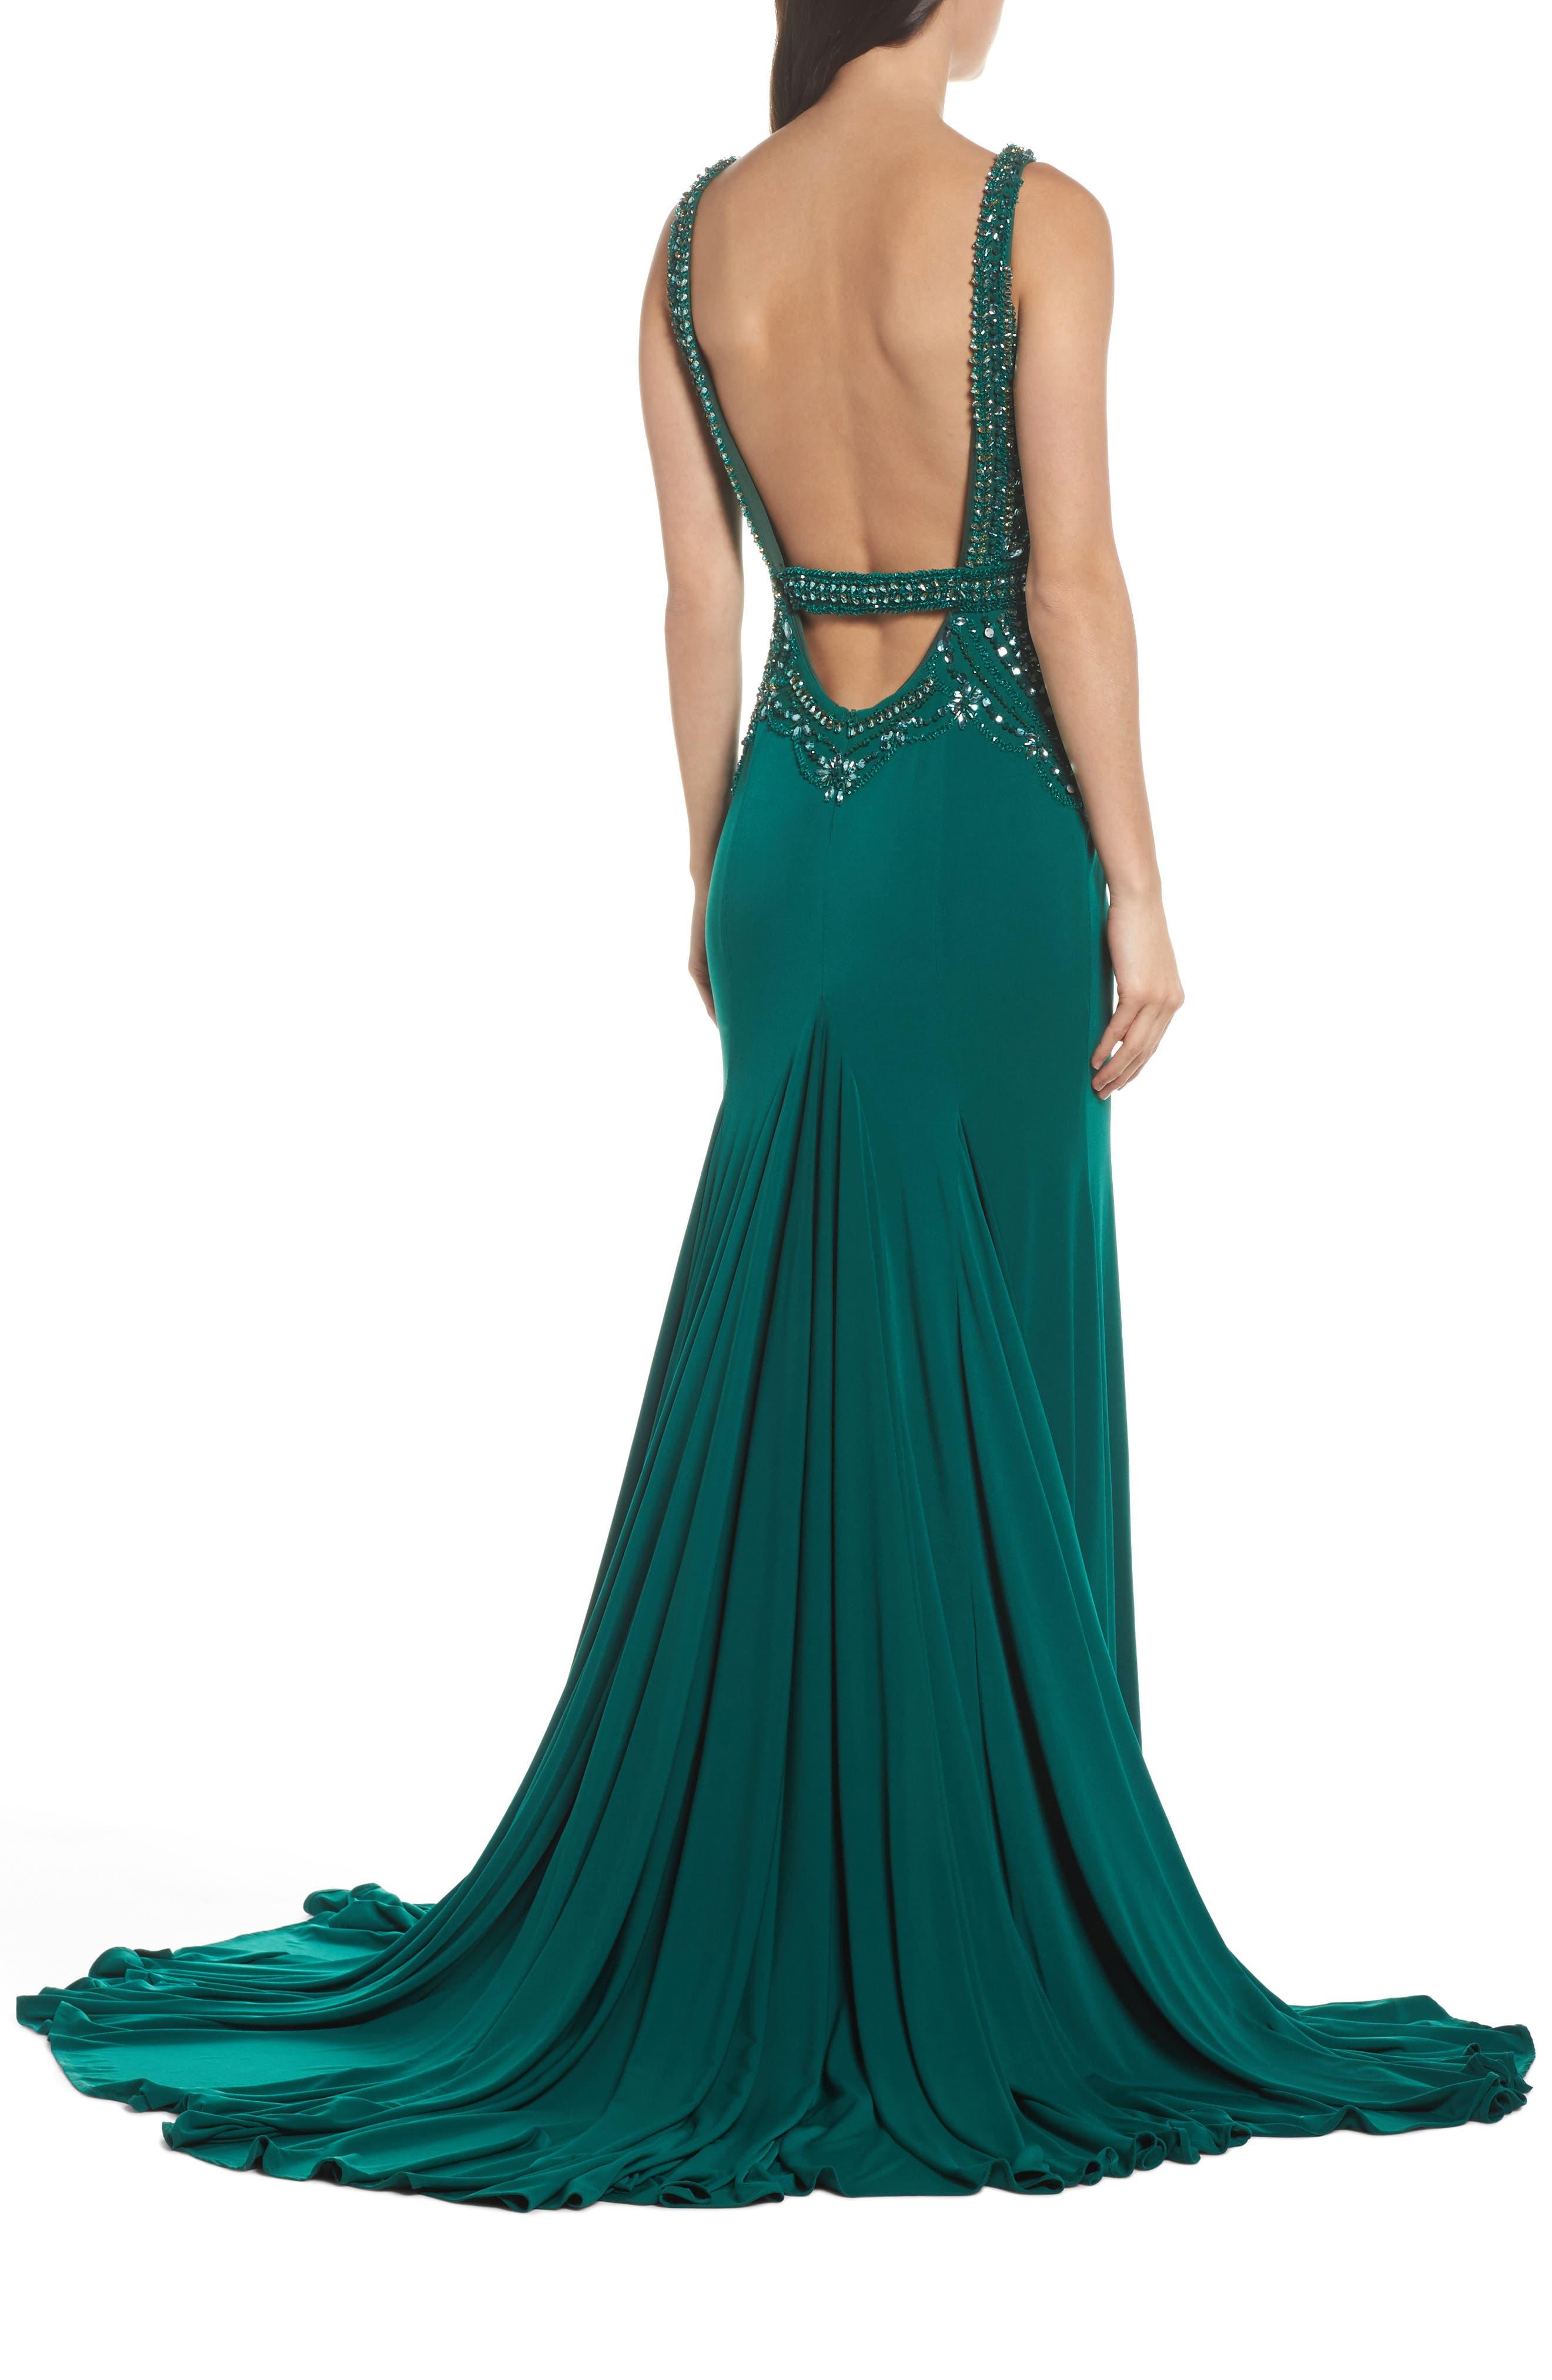 Red Sheath 2018 Prom Dresses | Nordstrom